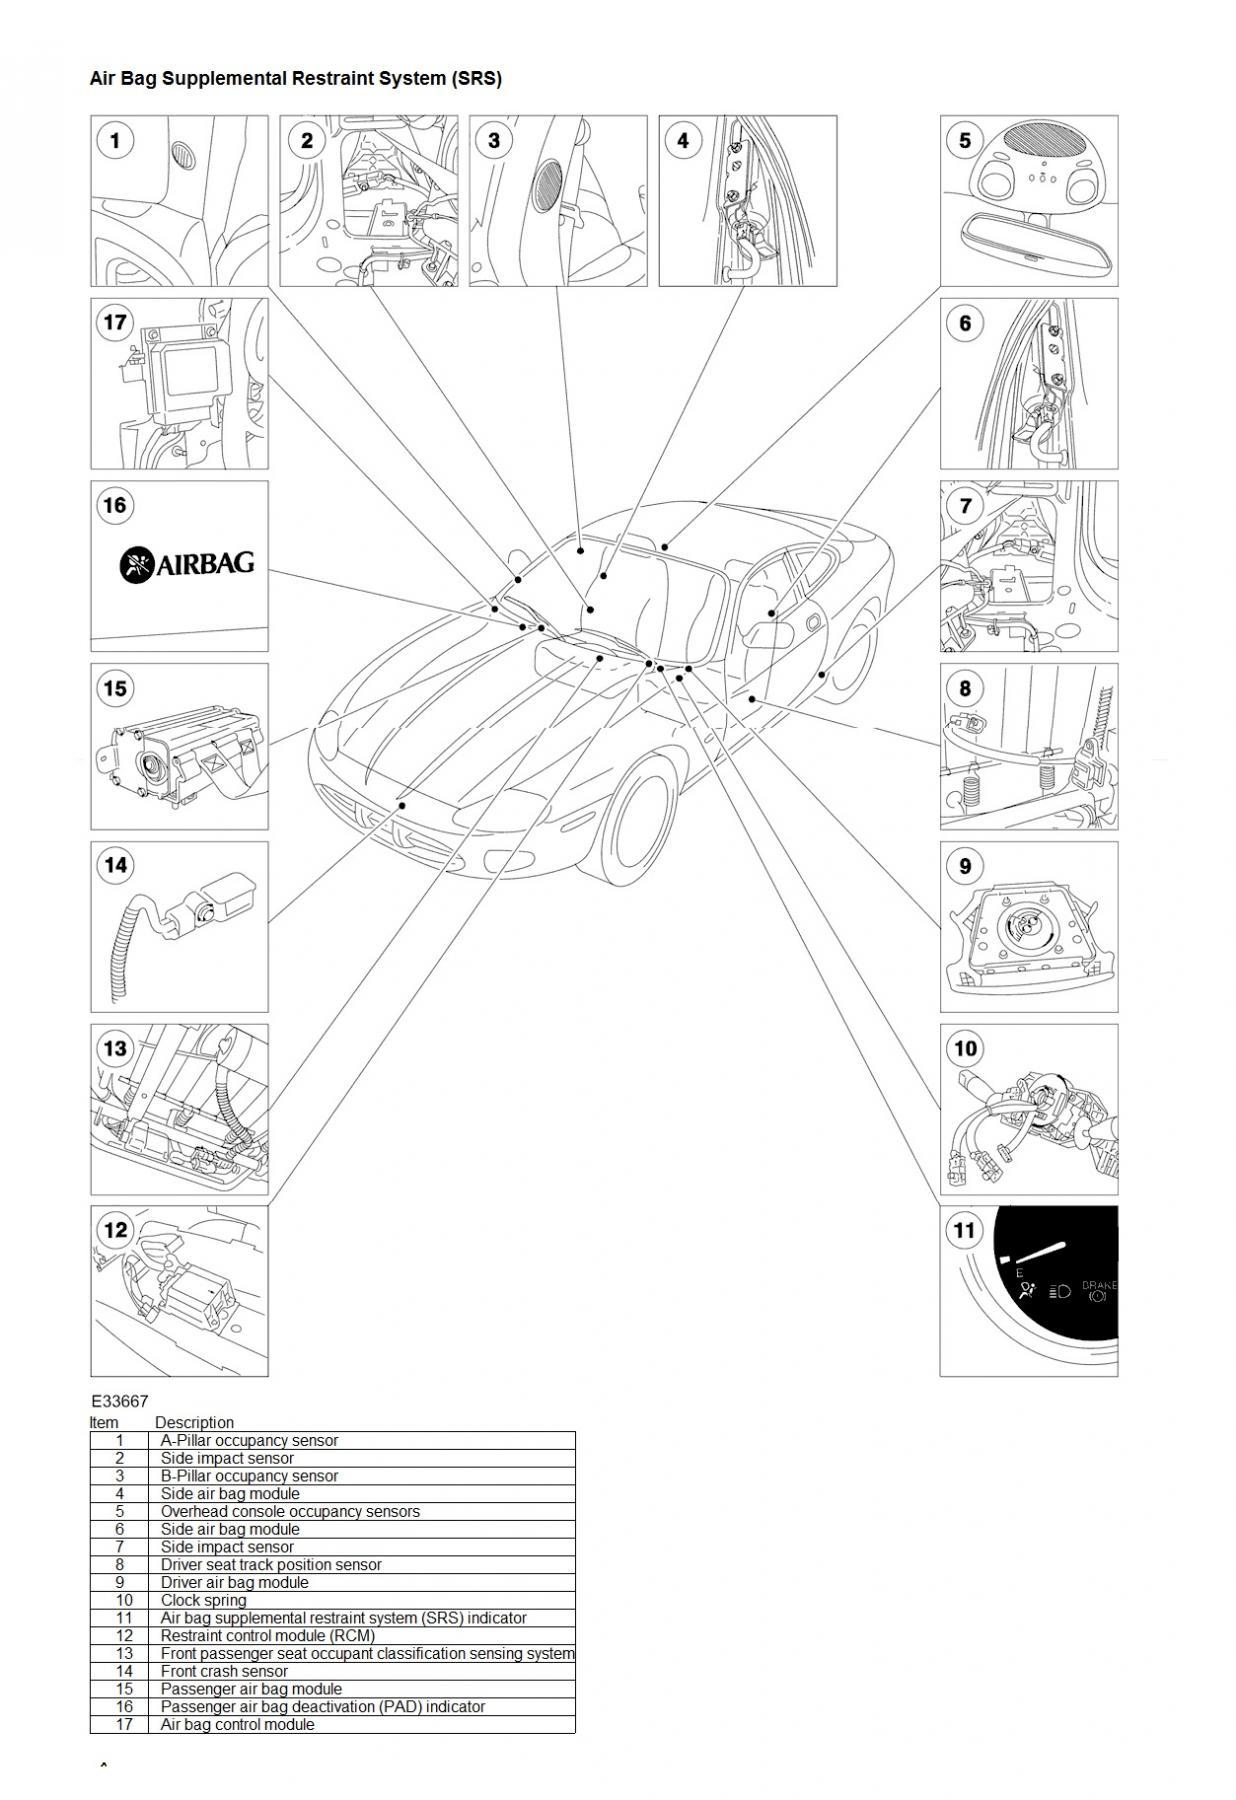 Airbag Warning Light Codes